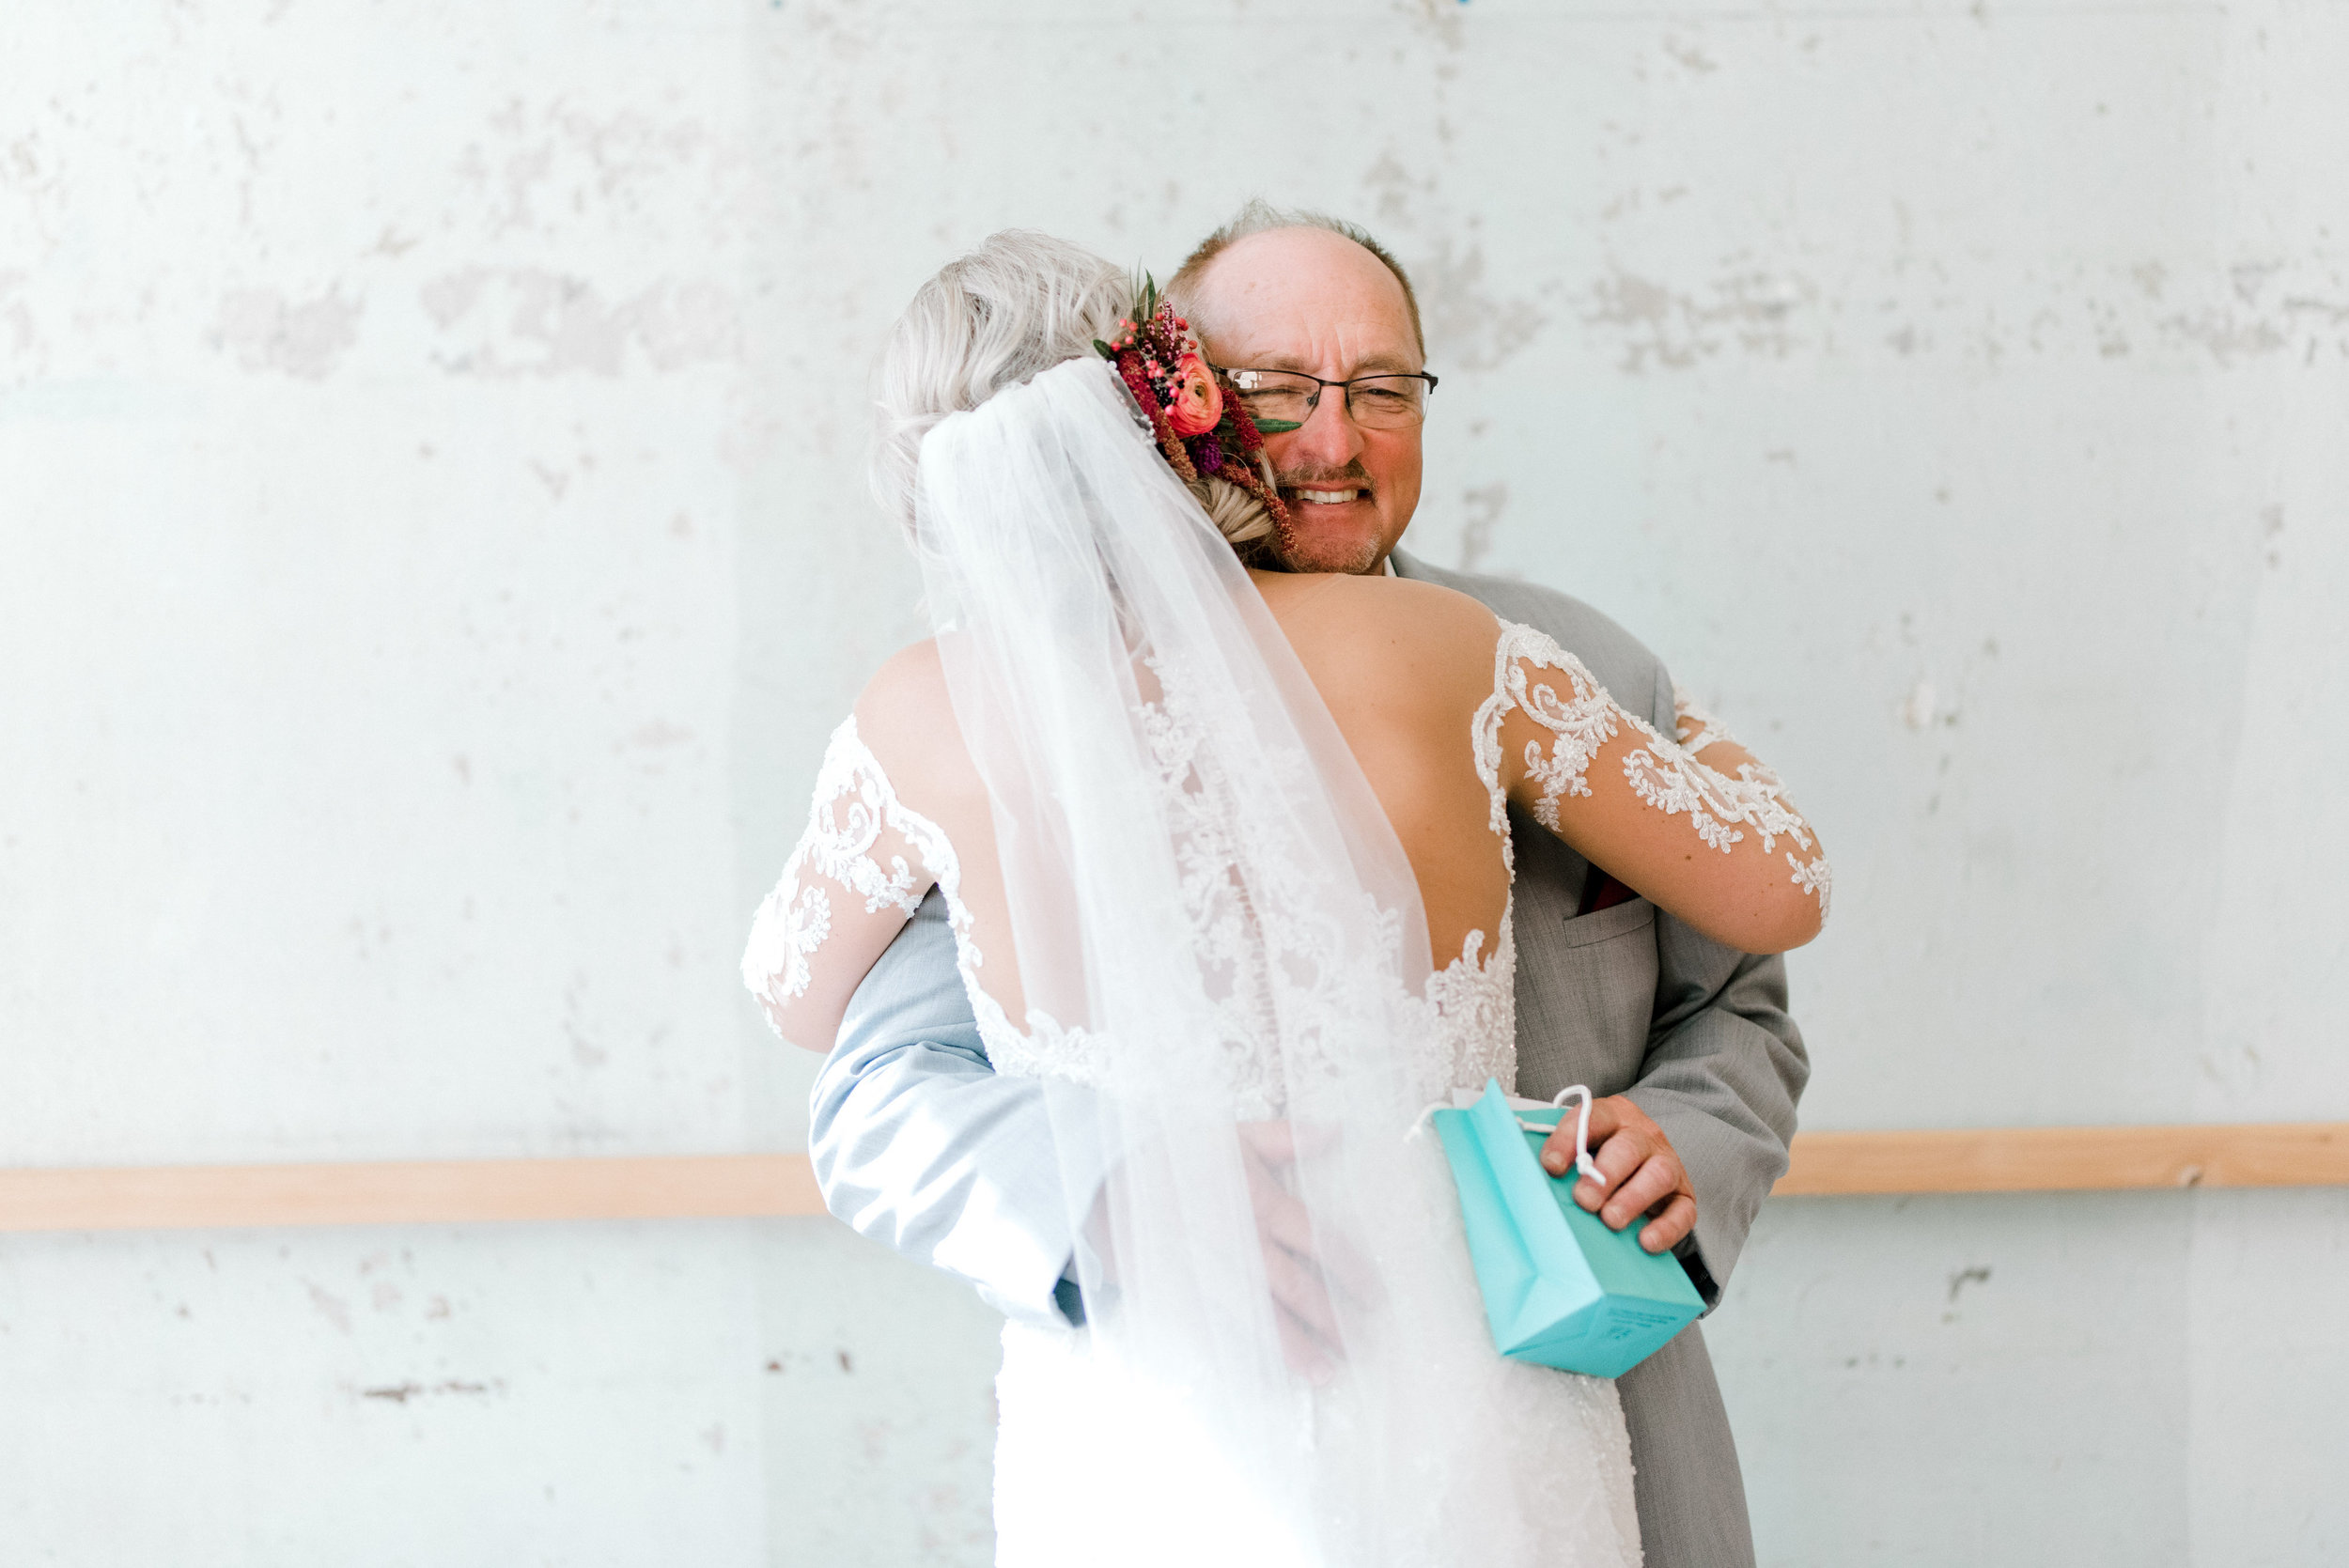 Ryan Alexa Married-Getting Ready First Look-0137.jpg